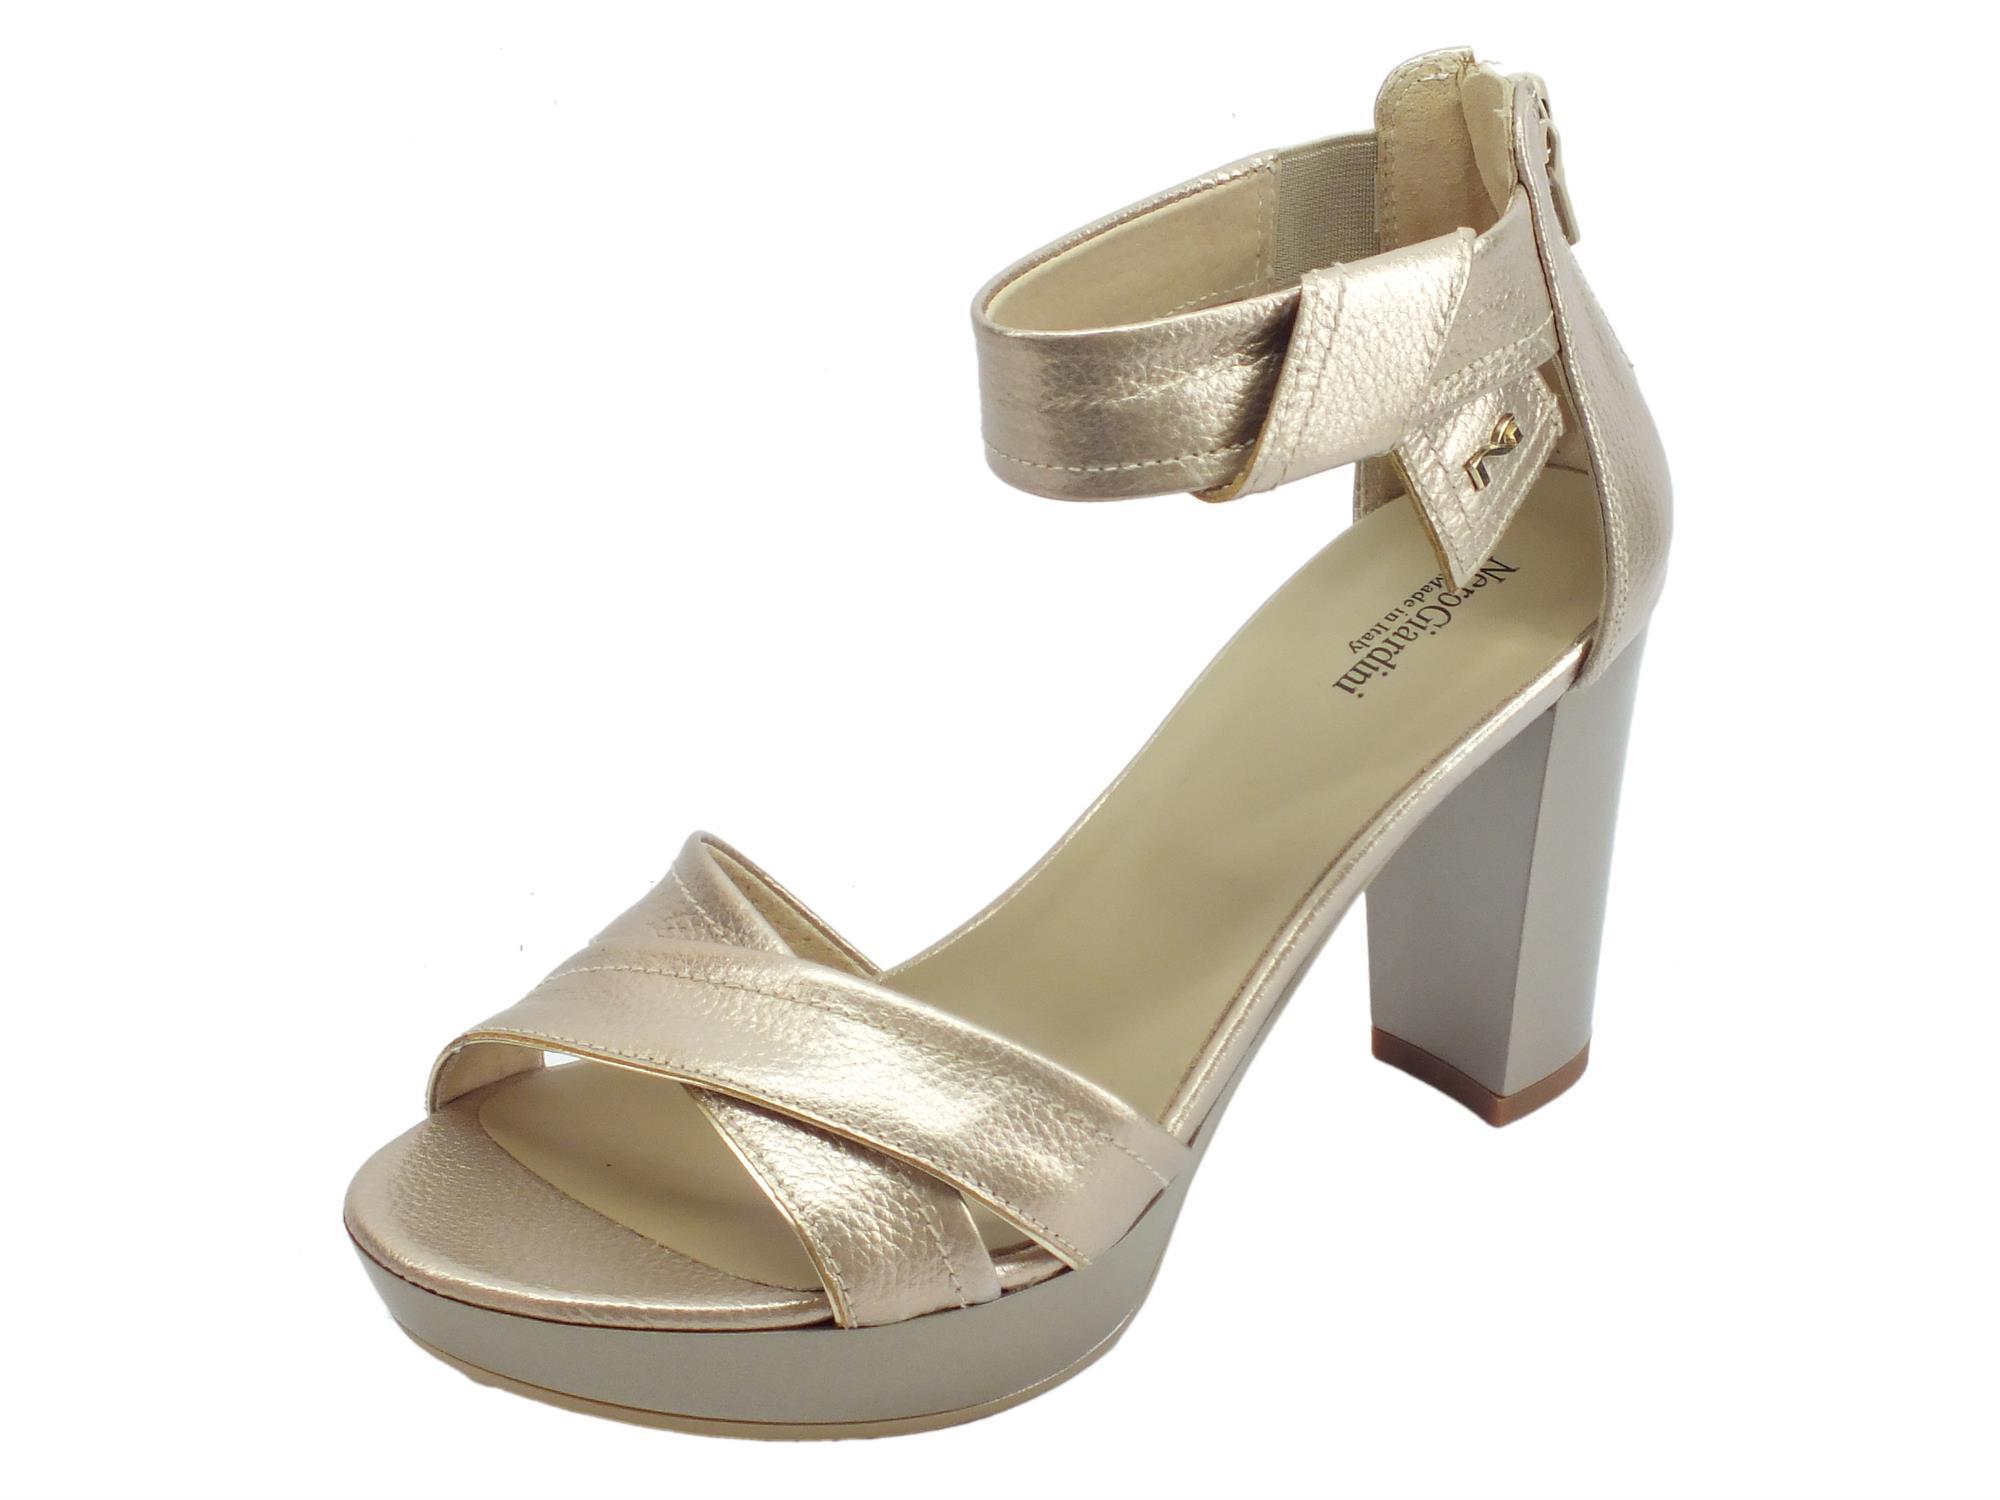 8a8179d0533764 NeroGiardini P908080D Marte Nut sandali eleganti tacco alto in pelle beige